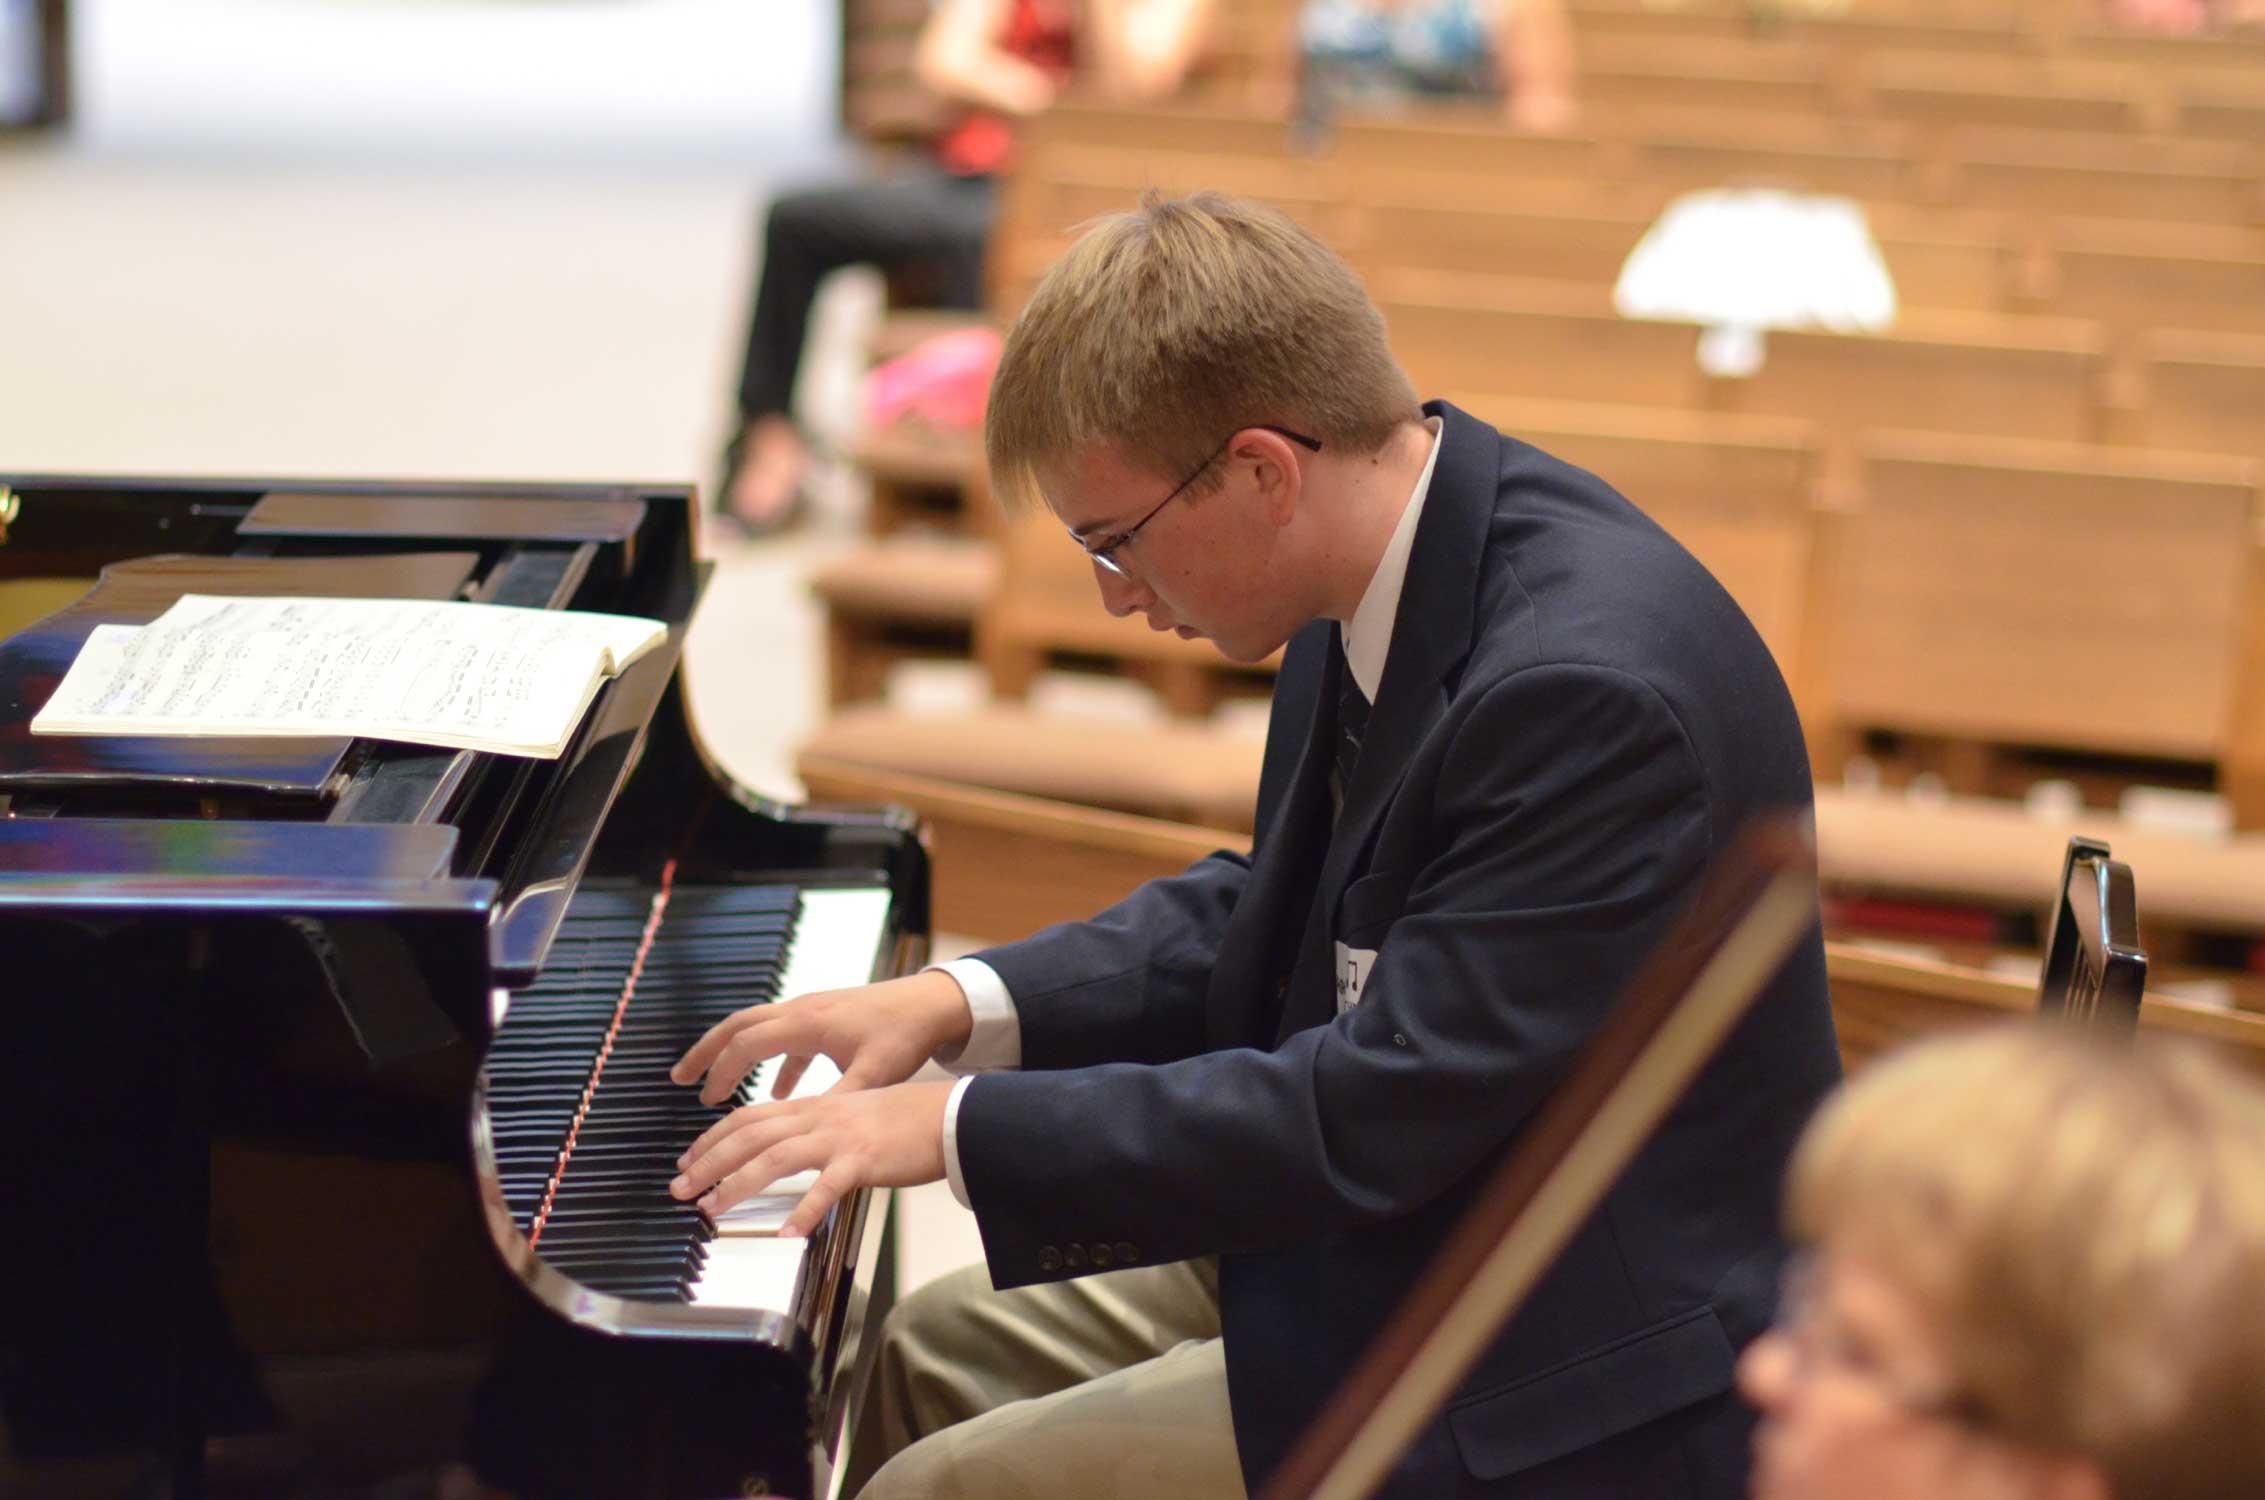 Aidan-at-Concerto-Event.jpg